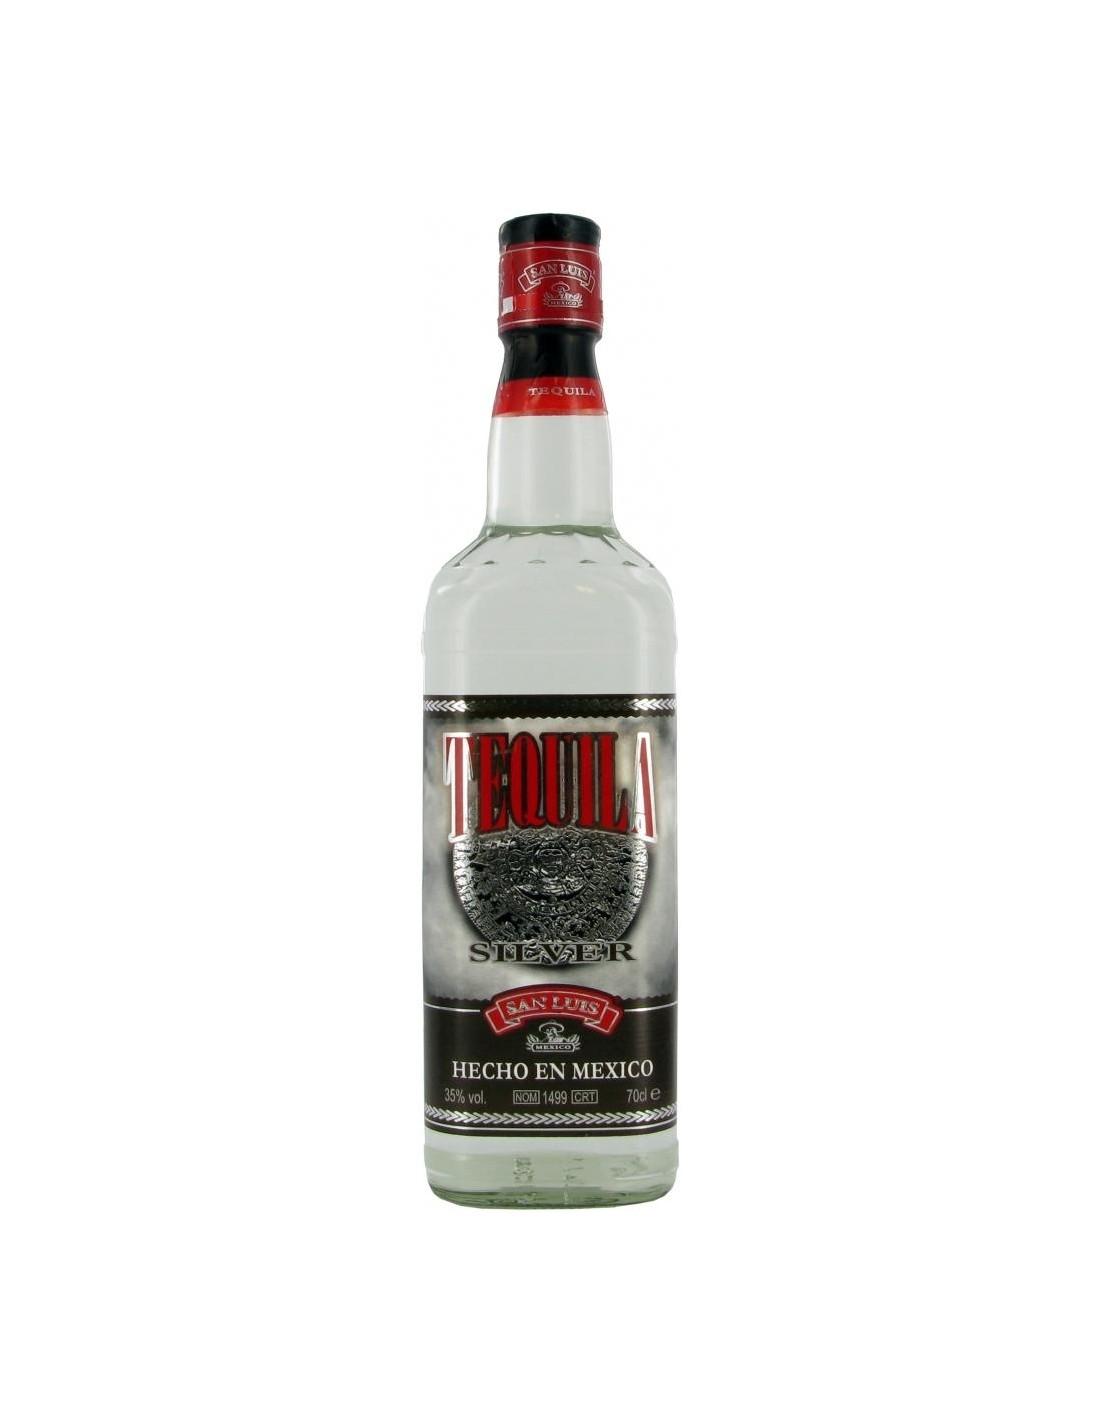 Tequila alba San Luis Silver 0.7L, 38% alc., Mexic